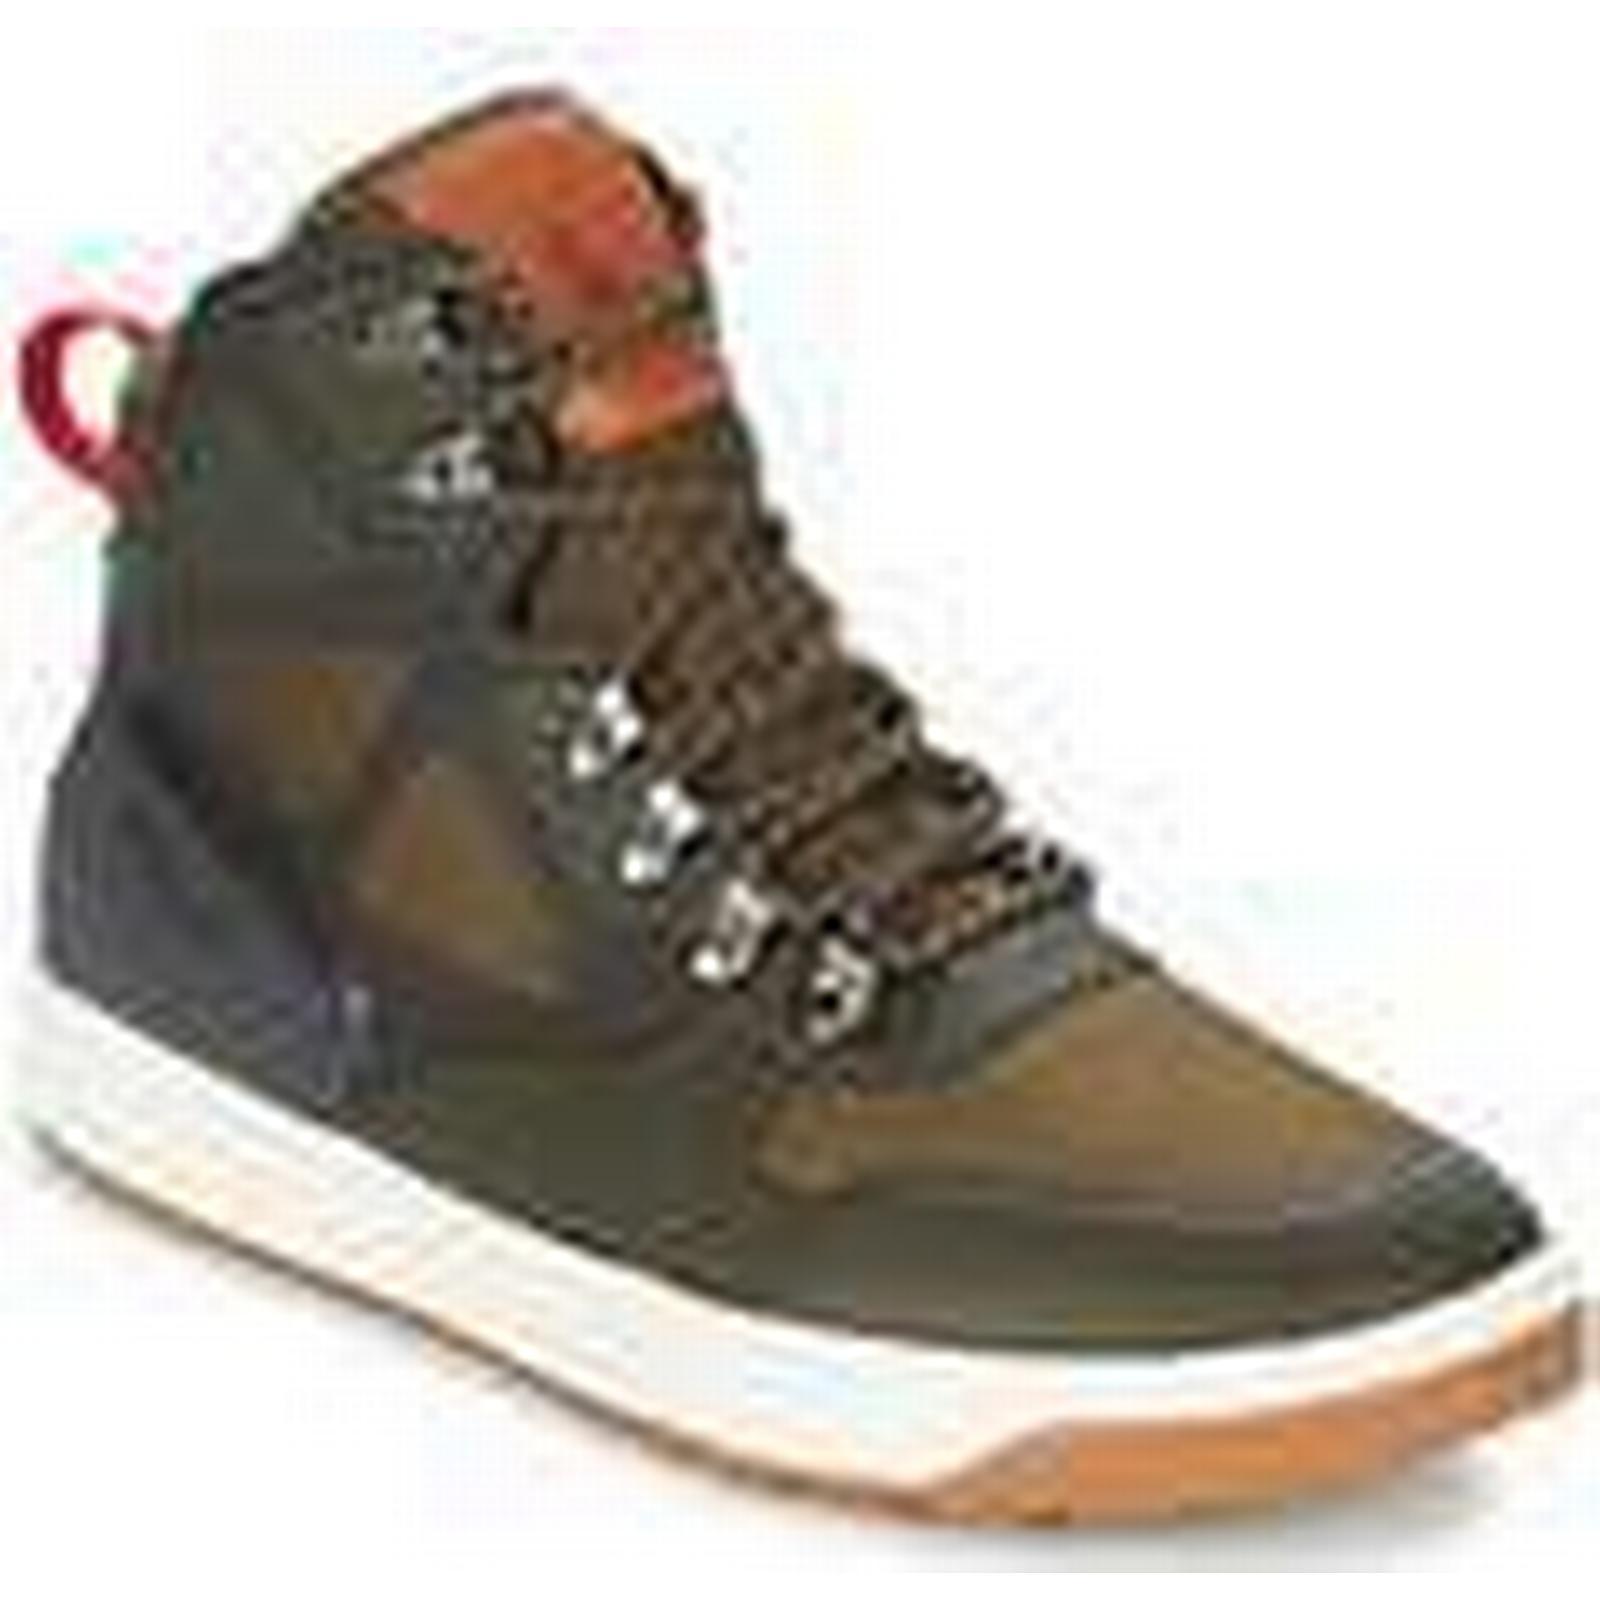 Polo Ralph Lauren Shoes  ALPINE200  men's Shoes Lauren (High-top Trainers) in Green 09e51f